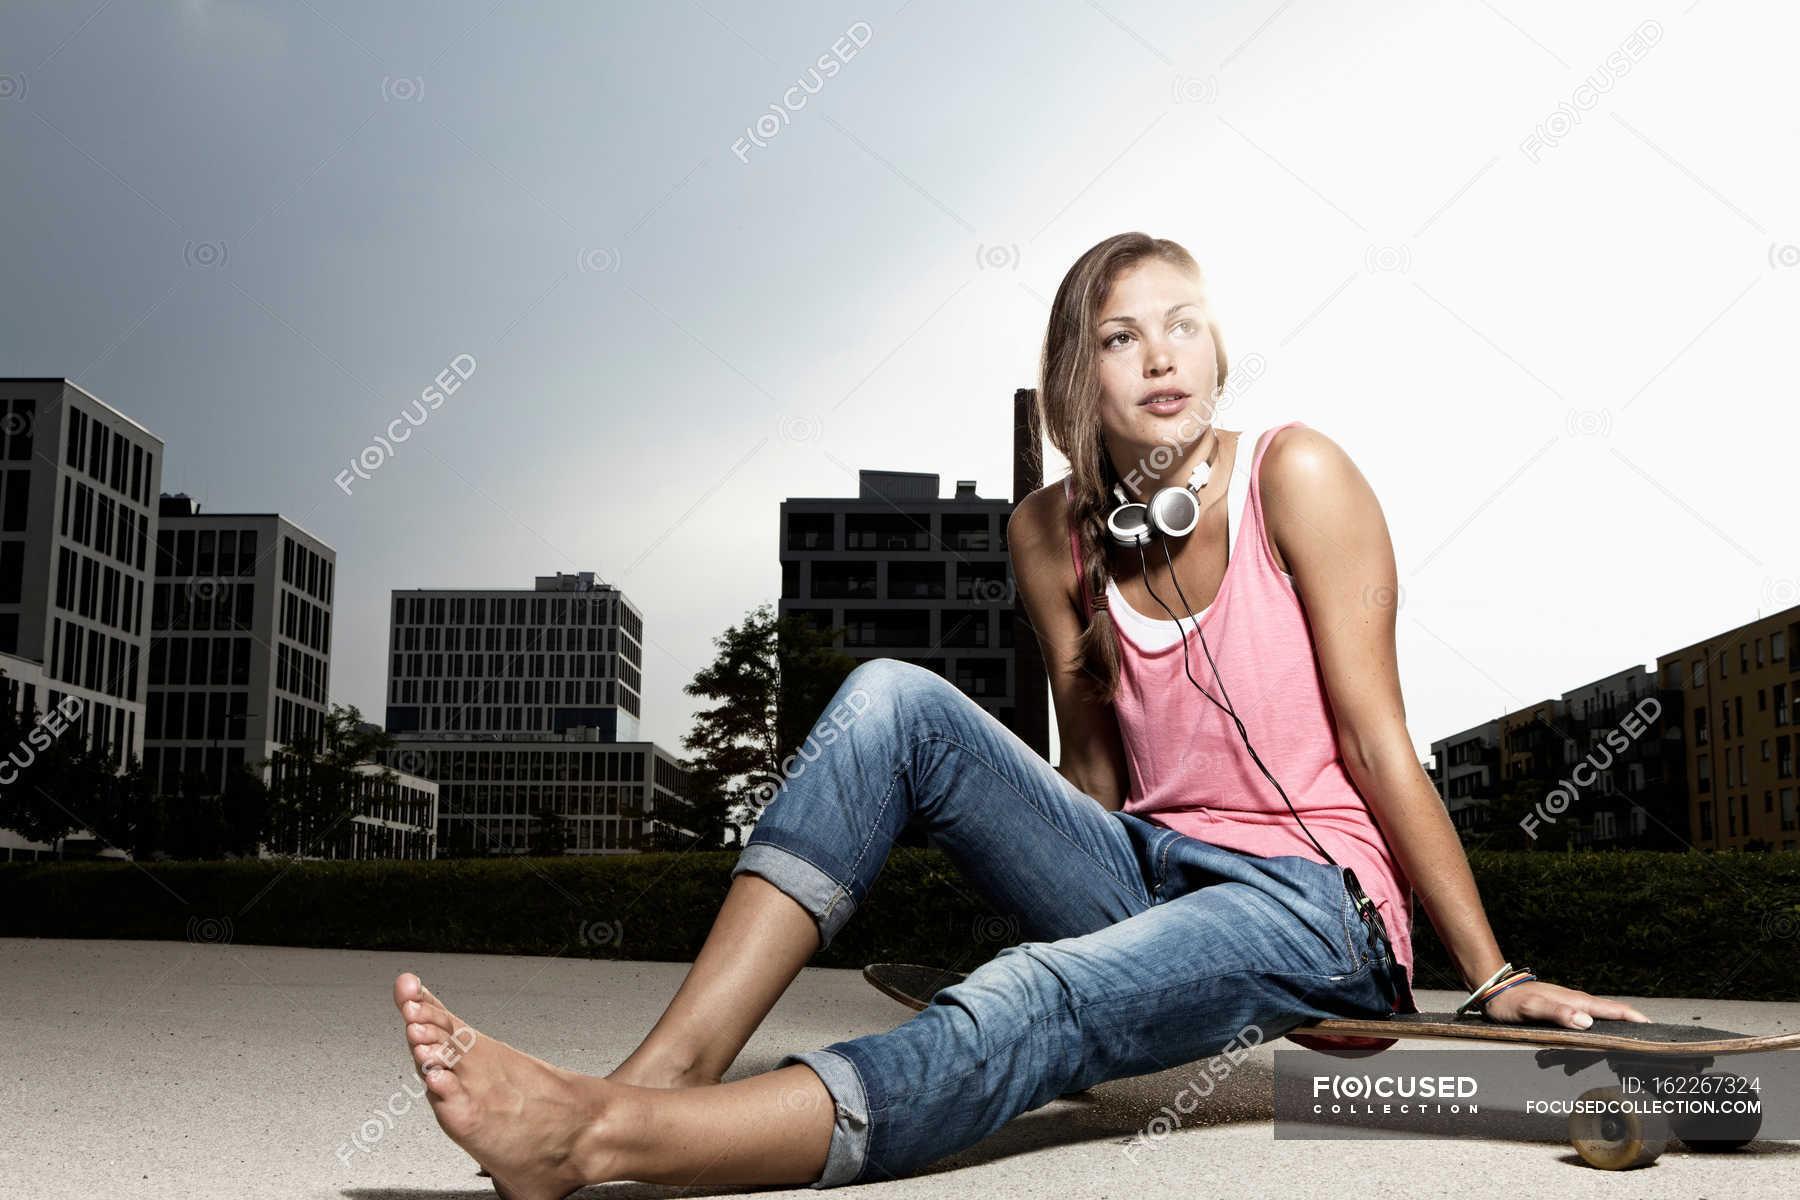 https://st.focusedcollection.com/13397678/i/1800/focused_162267324-stock-photo-woman-sitting-on-skateboard.jpg